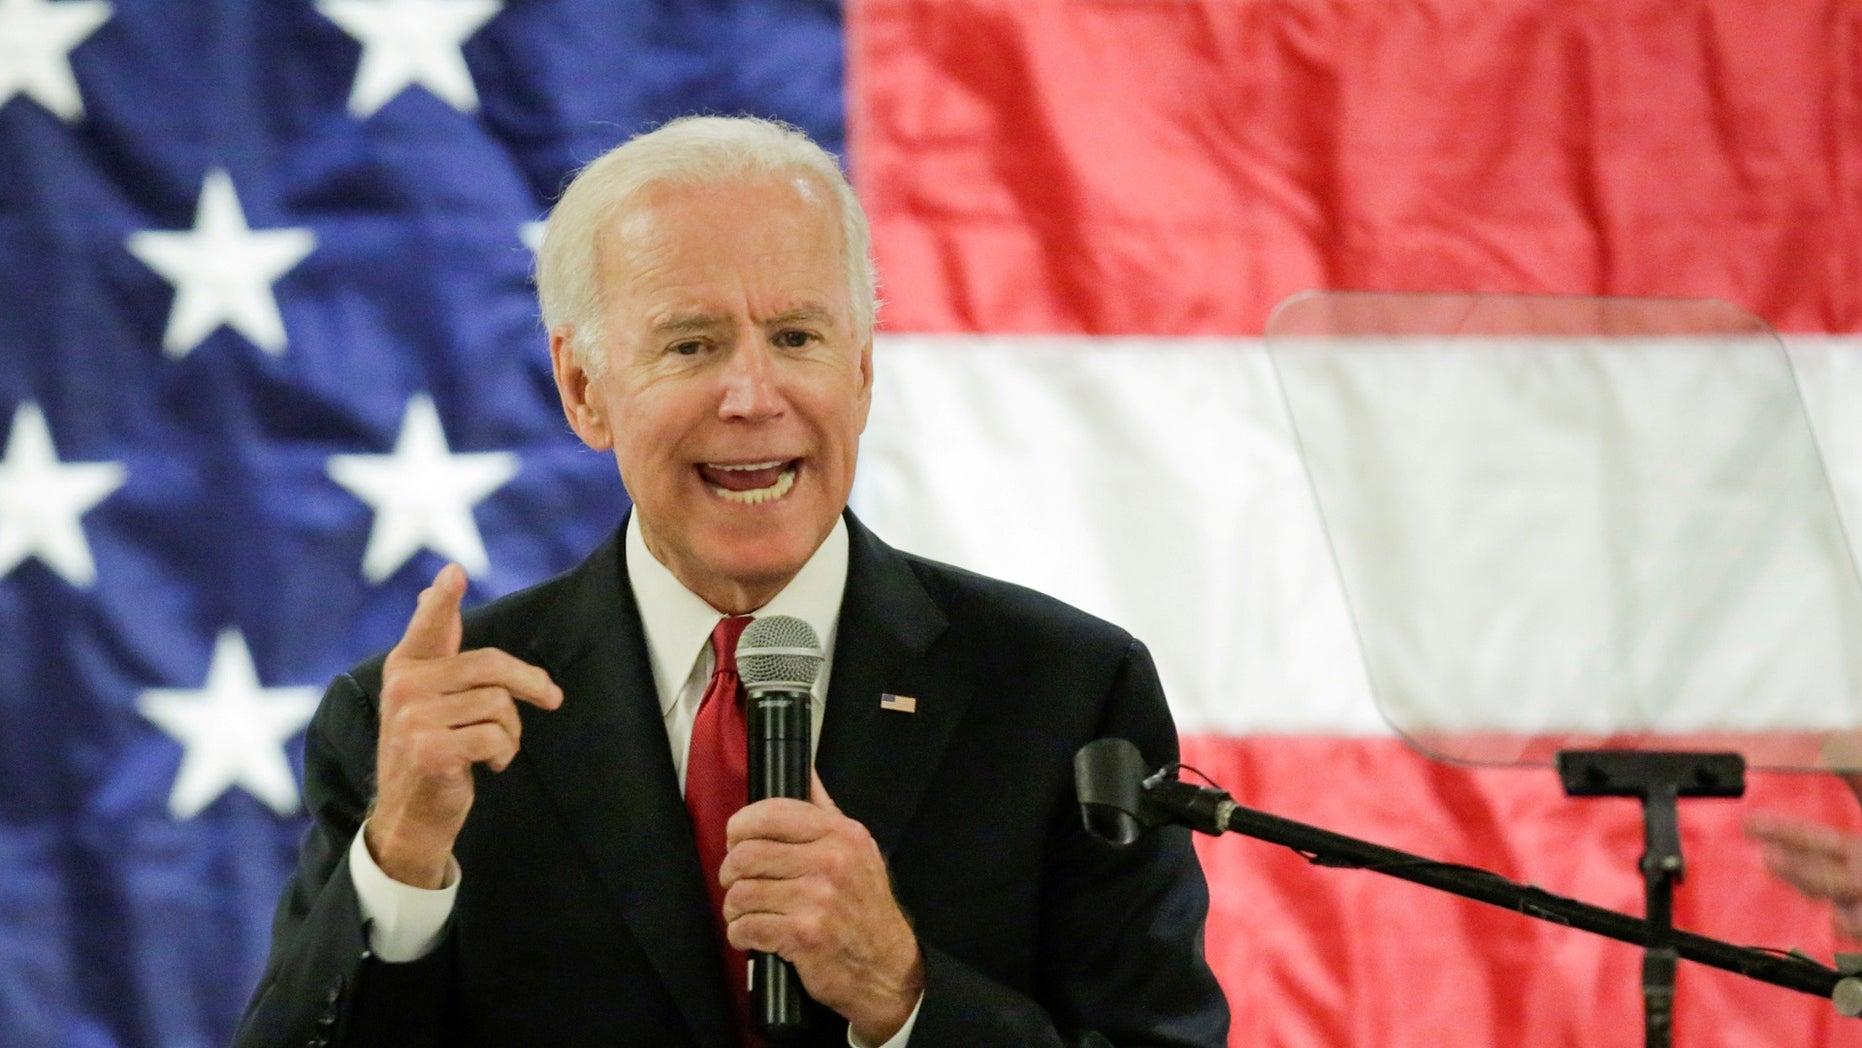 Former Vice President Joe Biden's potential 2020 presidential run may already be in jeopardy, Mark Steyn told Tucker Carlson on Monday night. (Reuters)